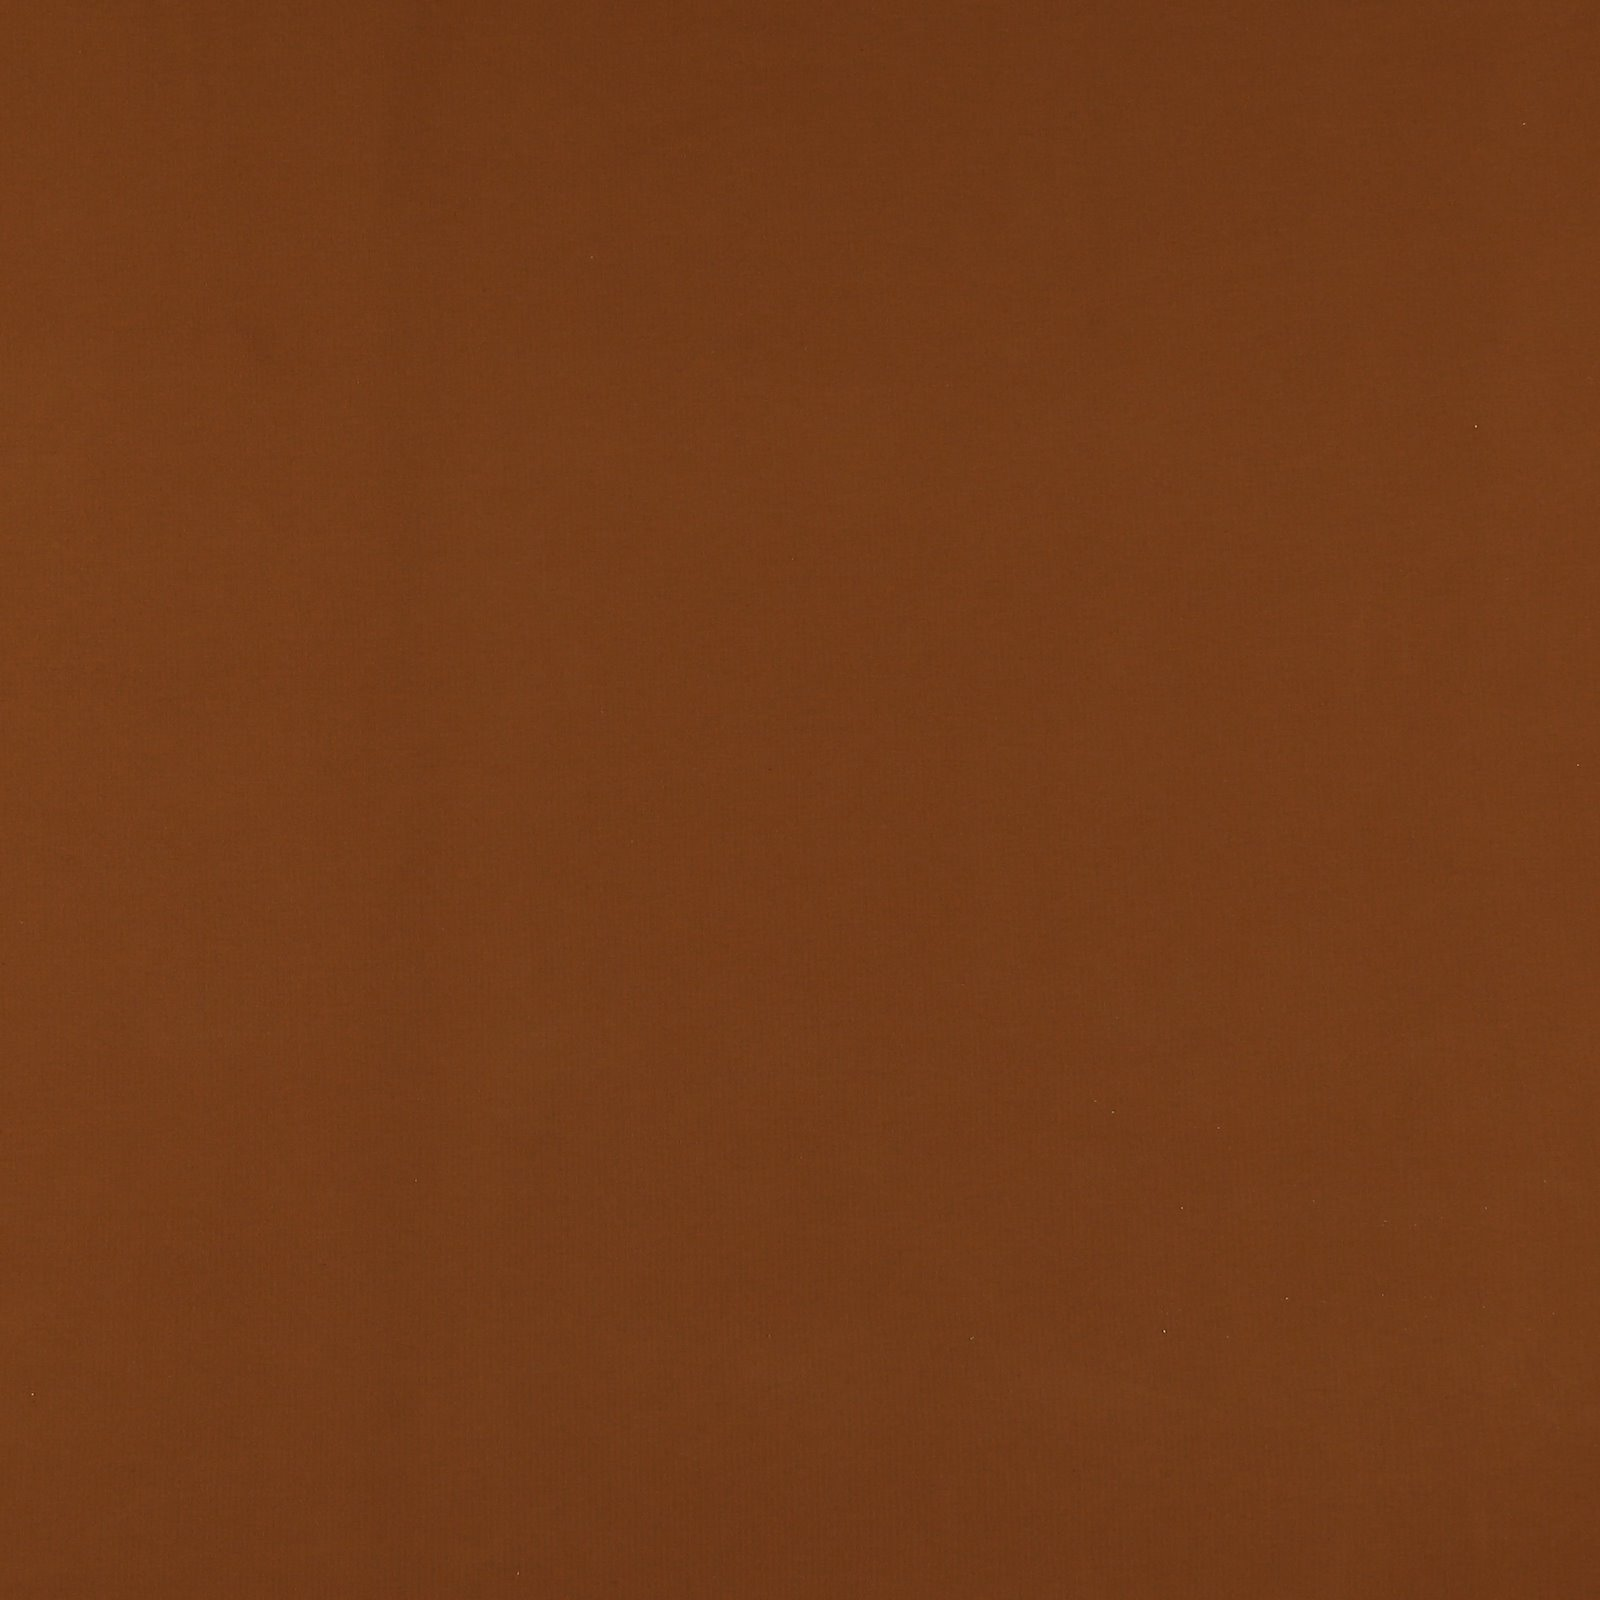 Organic stretch jersey dark caramel 272655_pack_solid